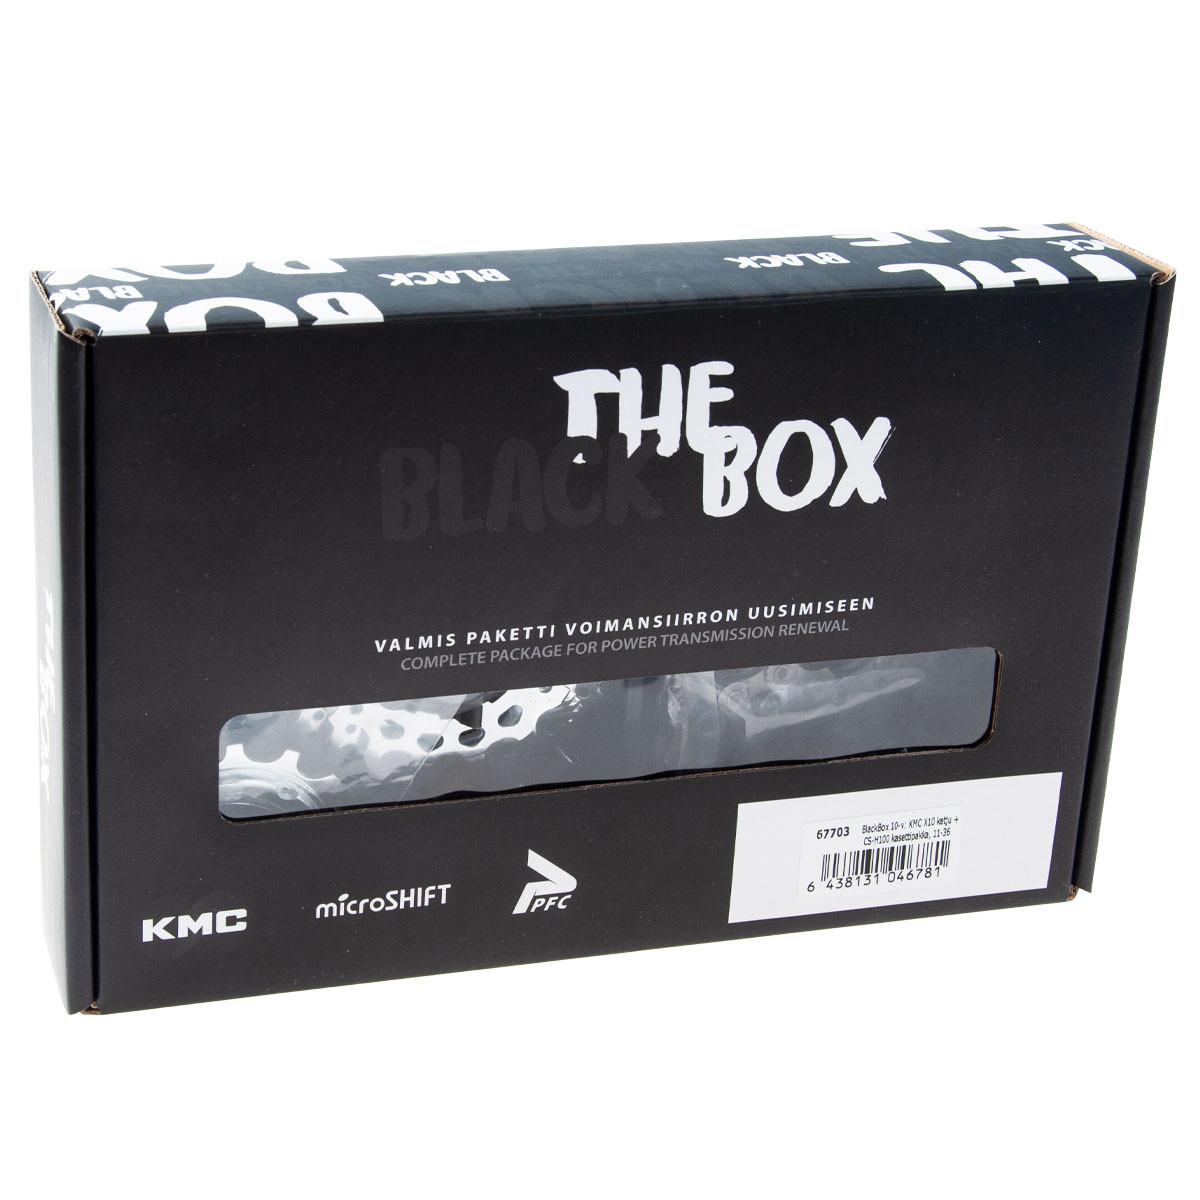 BlackBox 9-v: KMC X9-73 ketju + CS-H092 kasettipakka, 11-32